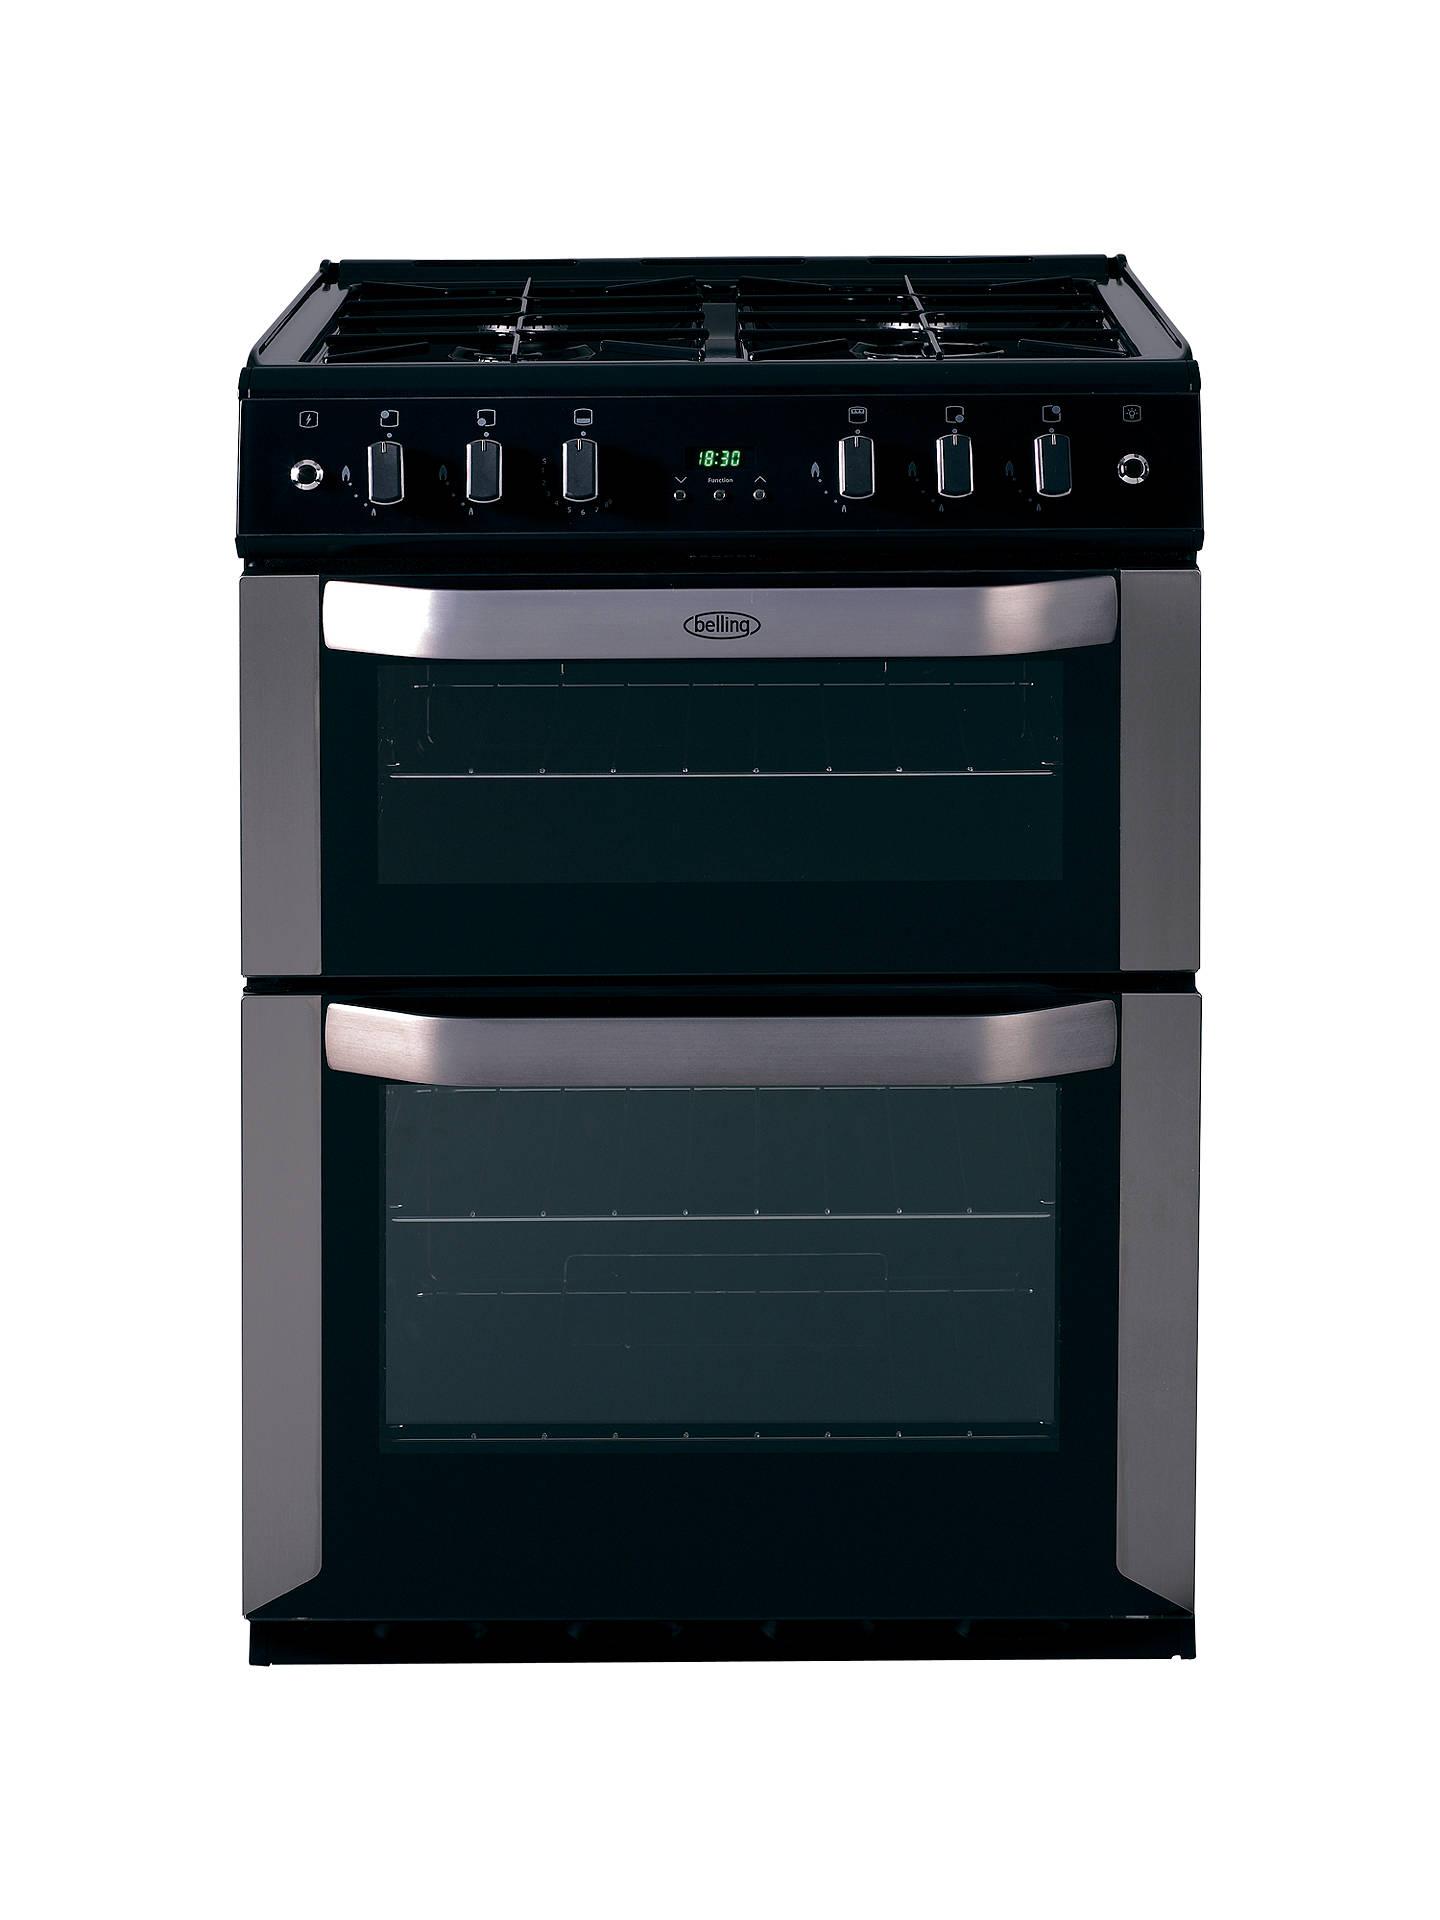 belling fsg60tc freestanding gas cooker stainless steel. Black Bedroom Furniture Sets. Home Design Ideas